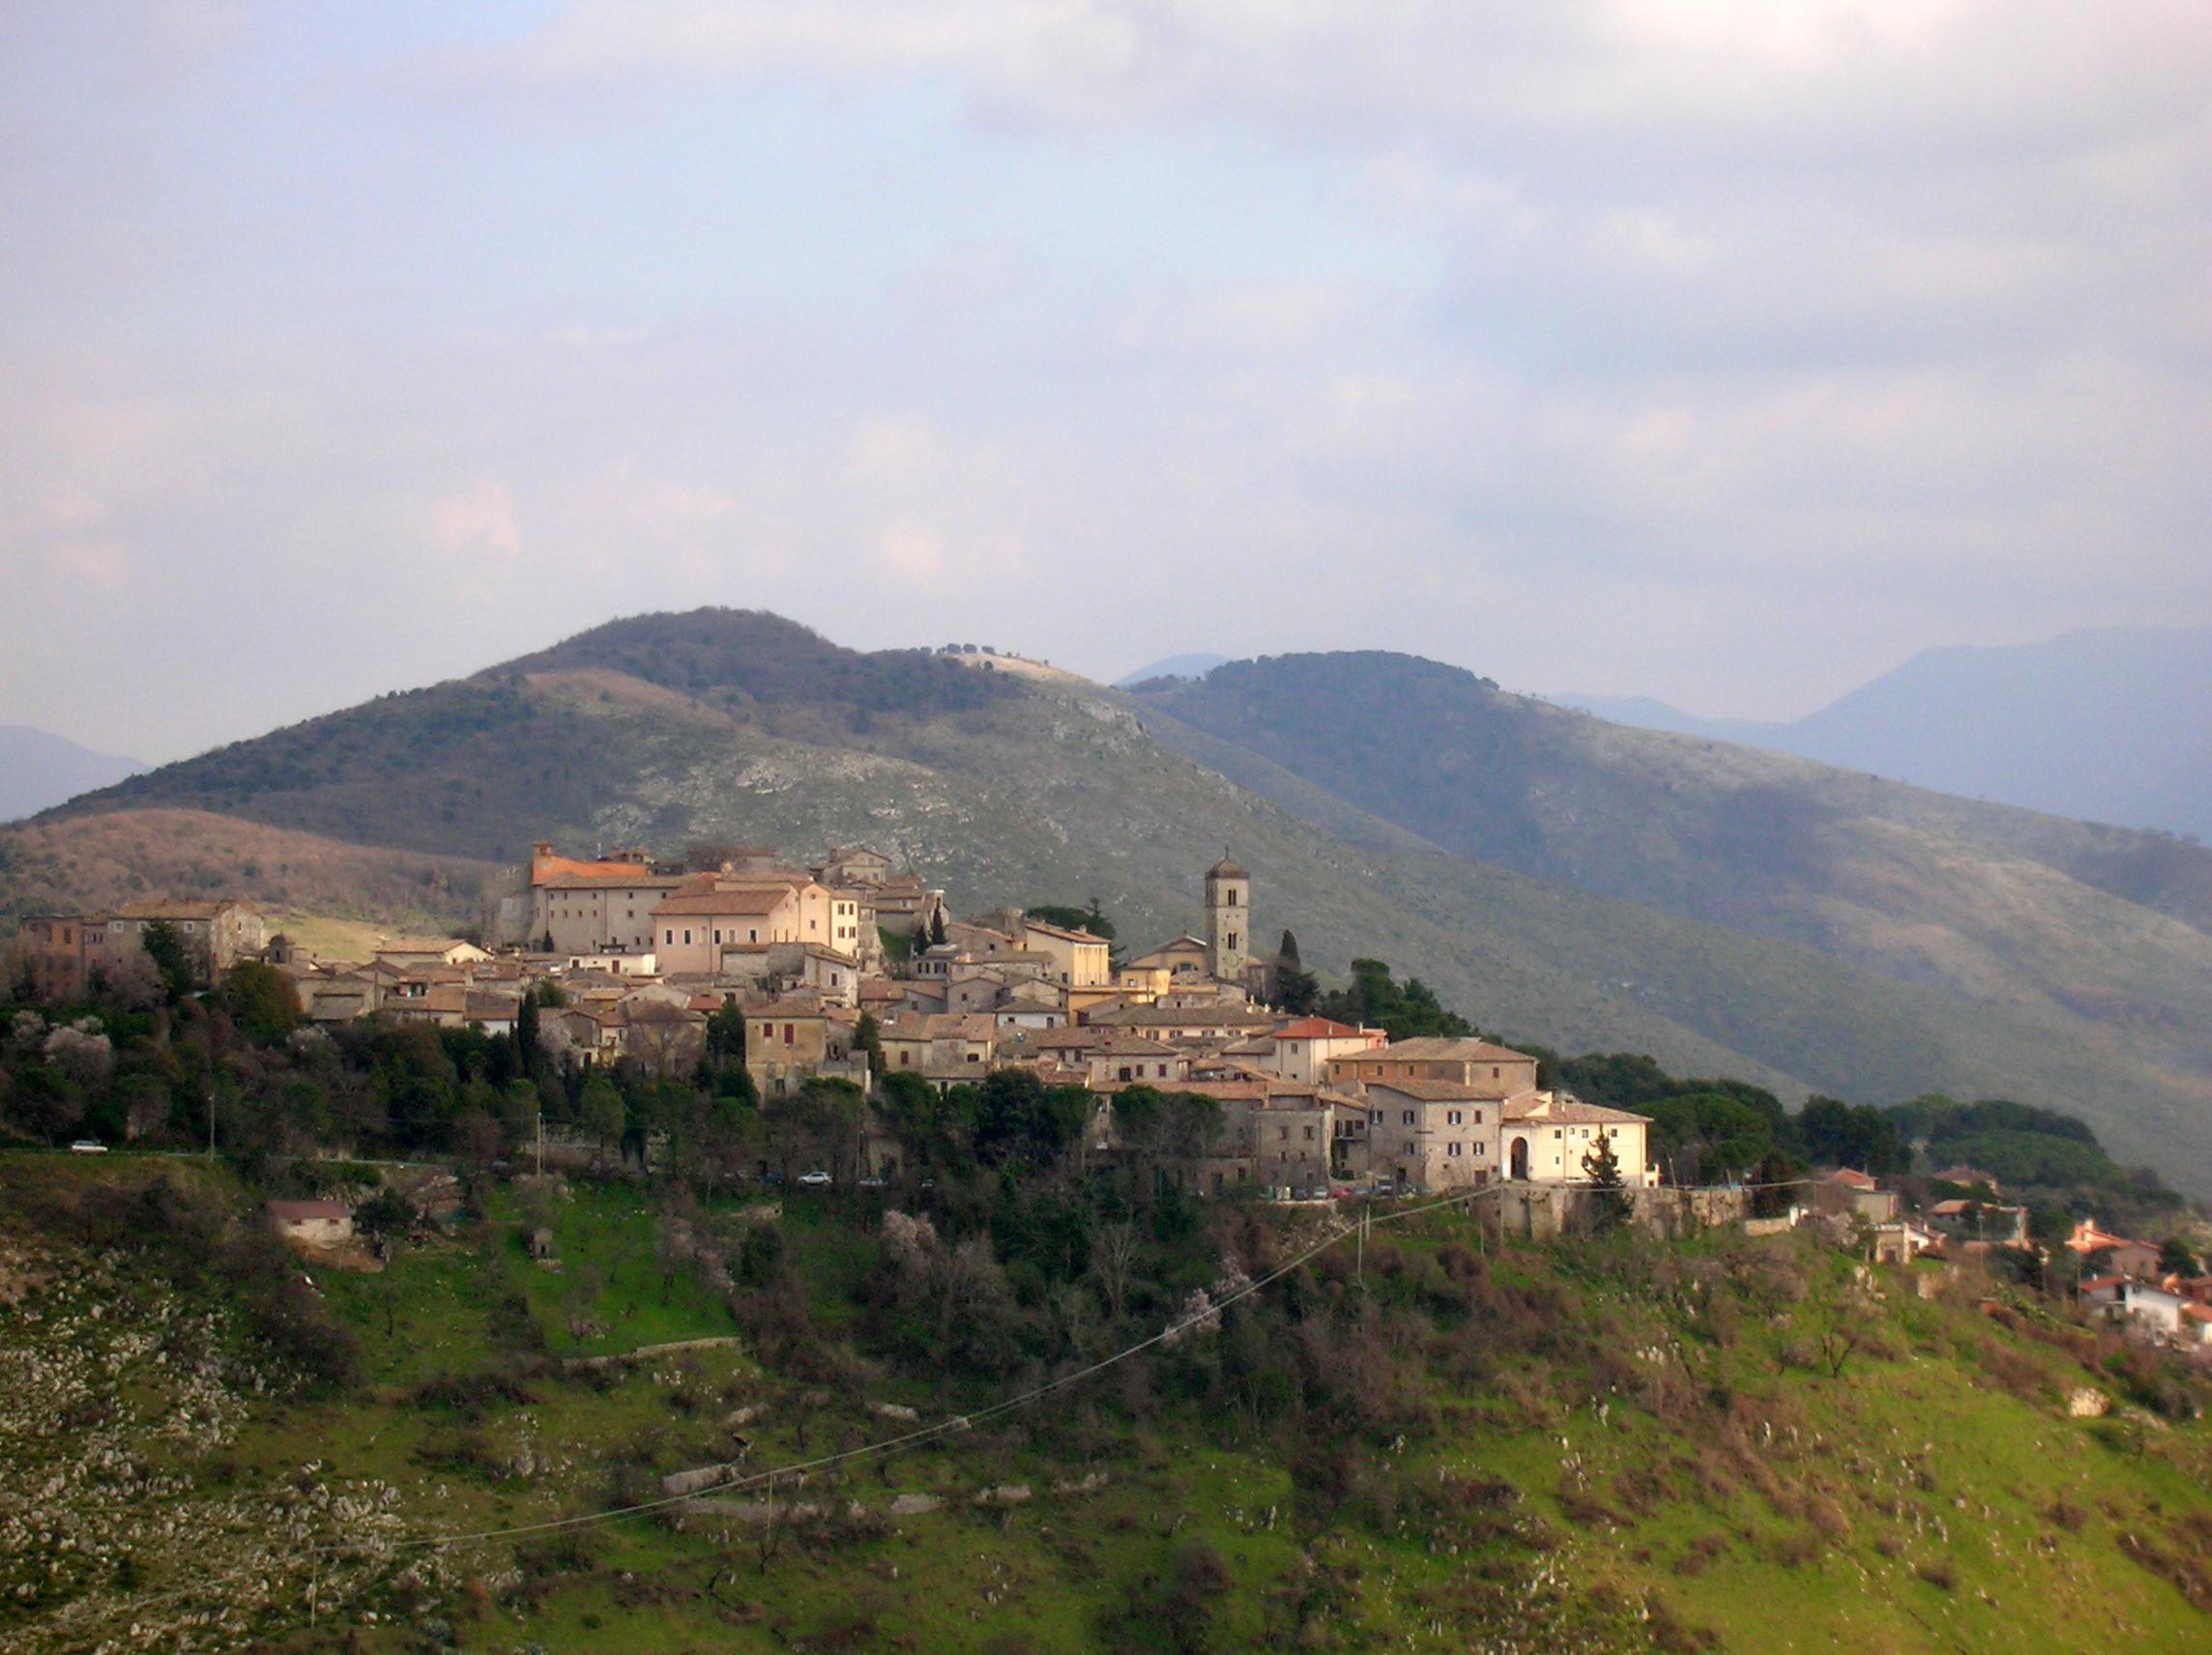 Comune Di Montopoli Di Sabina fara in sabina - wikipedia